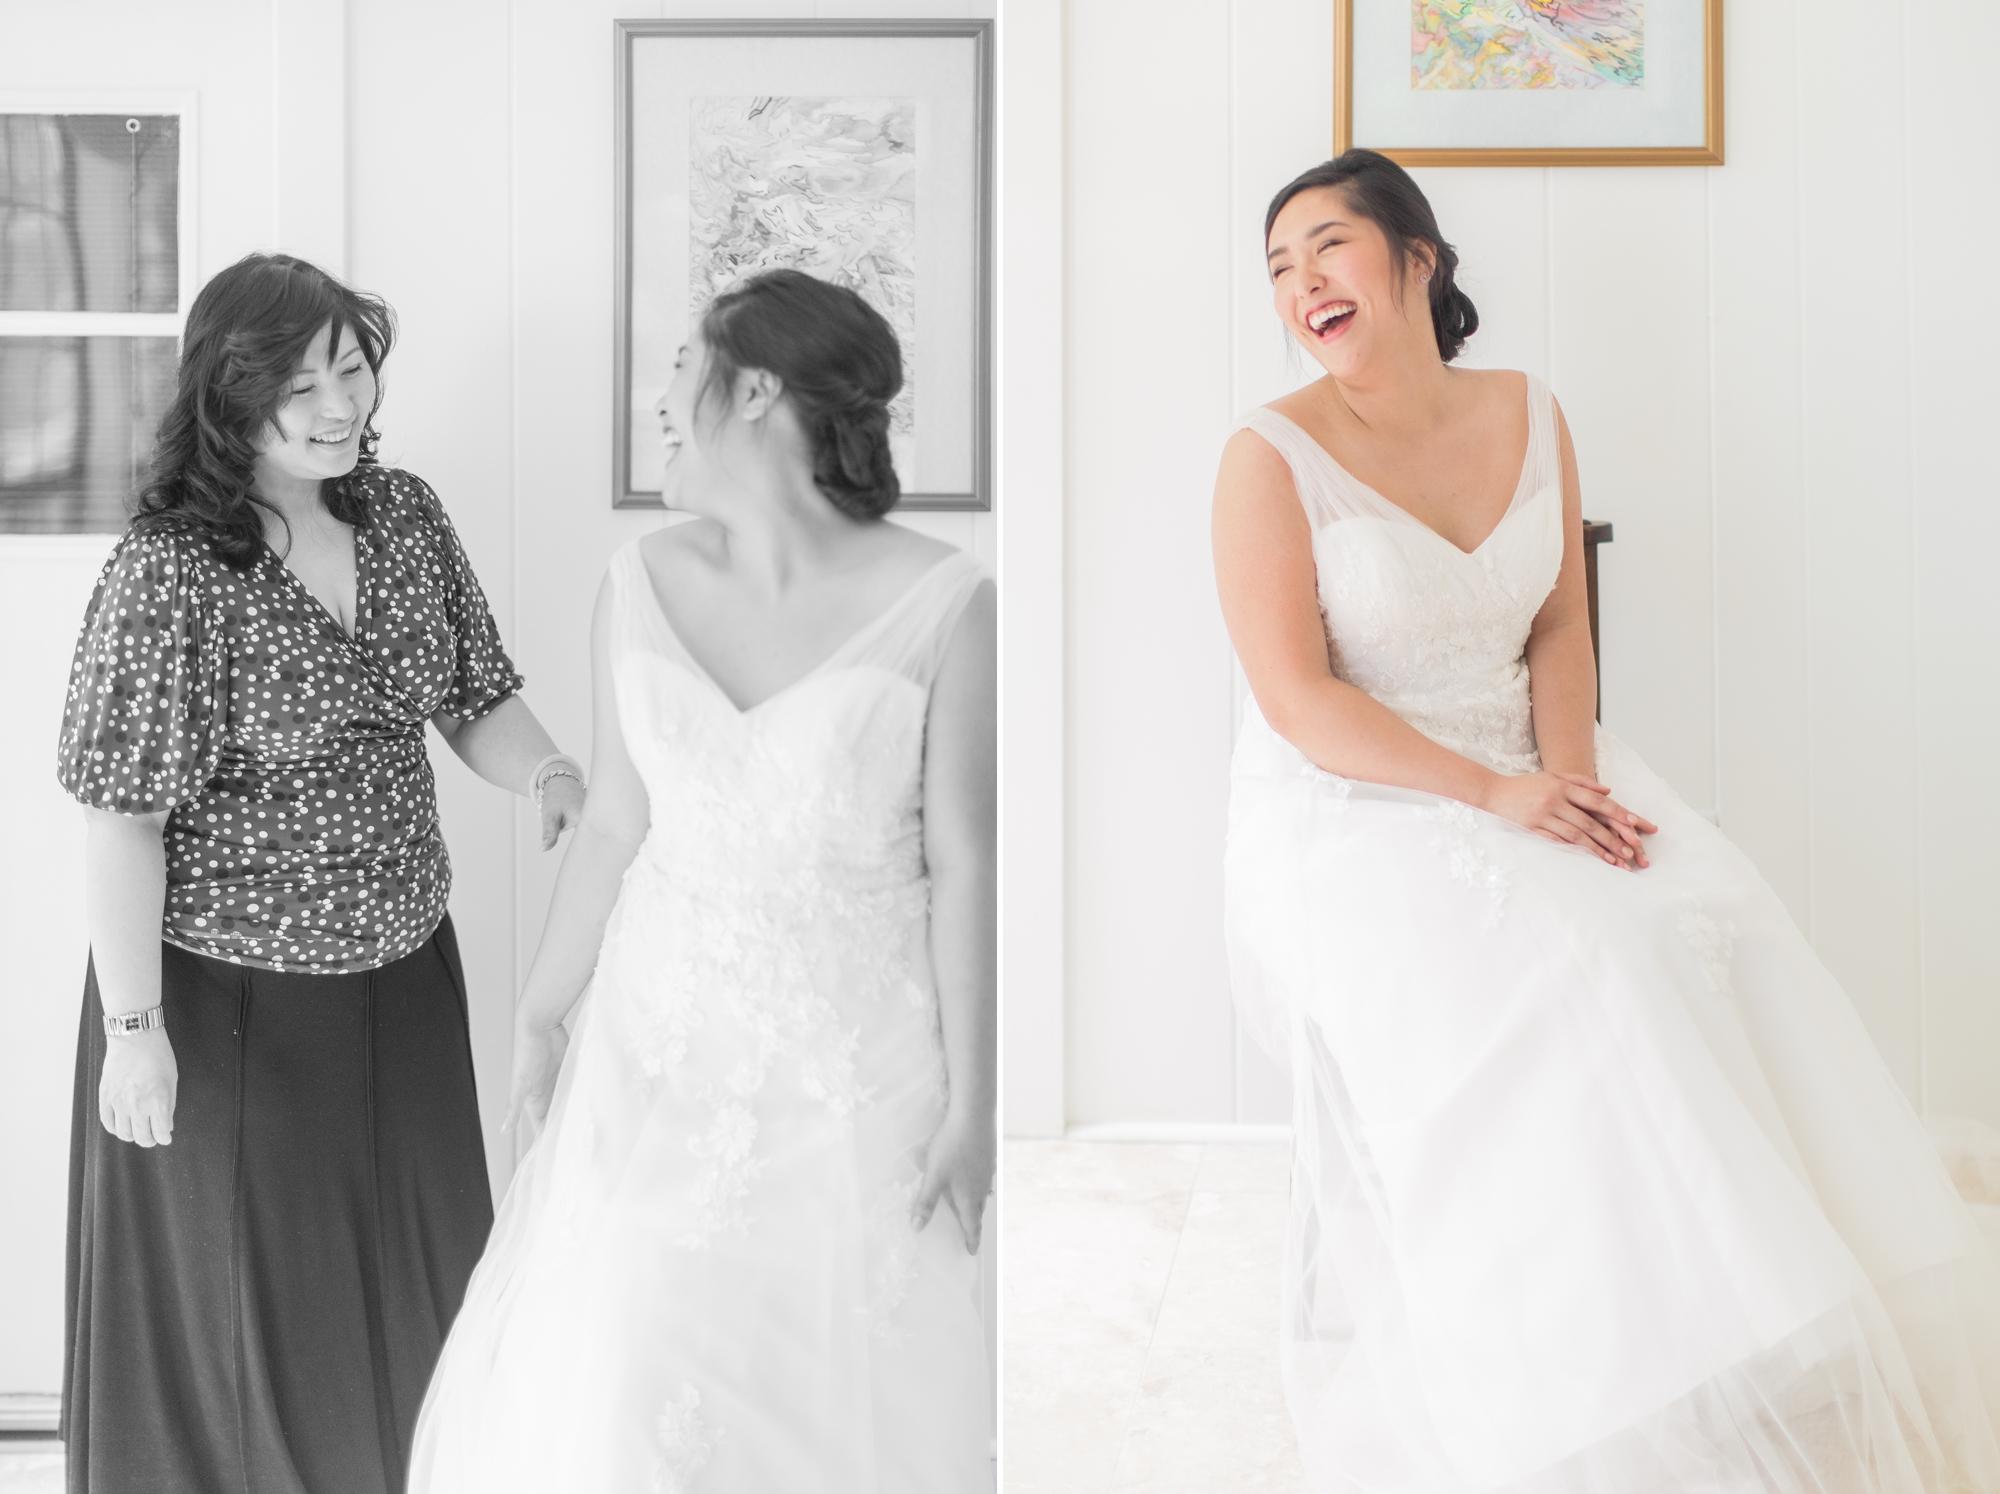 giles wedding blog 9.jpg